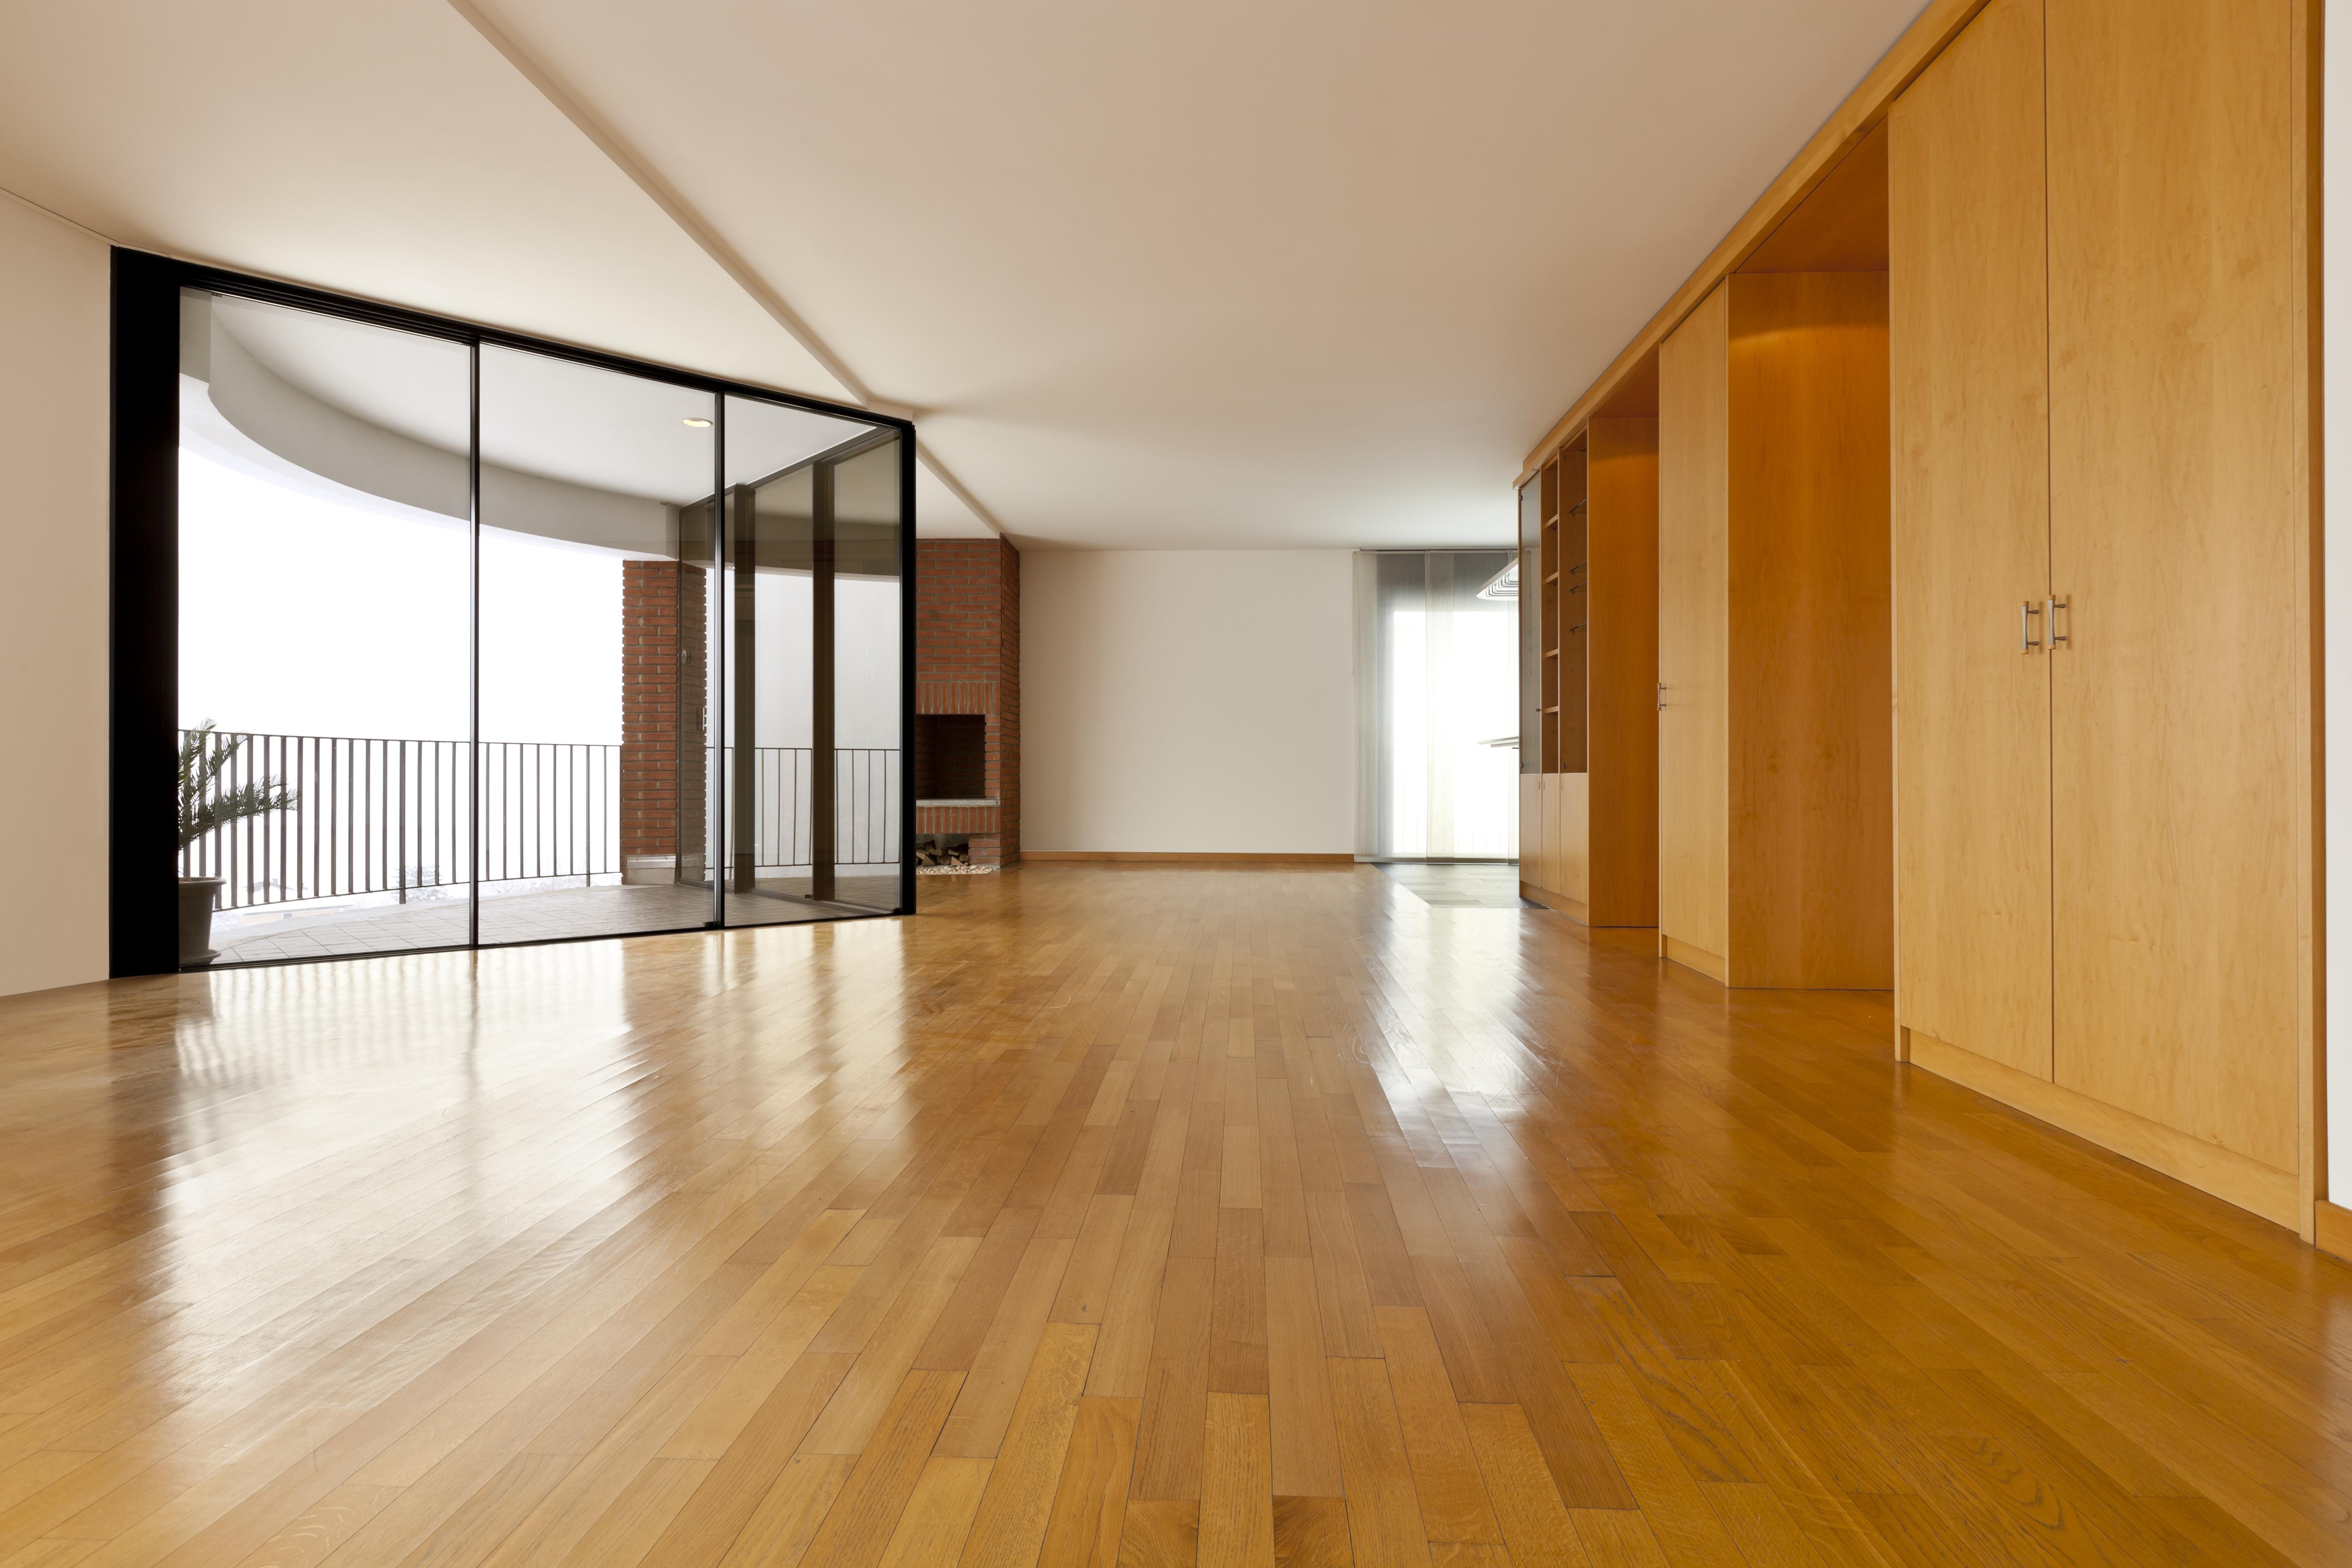 Bona professional 128 oz hardwood floor cleaner gallon for Hardwood flooring online